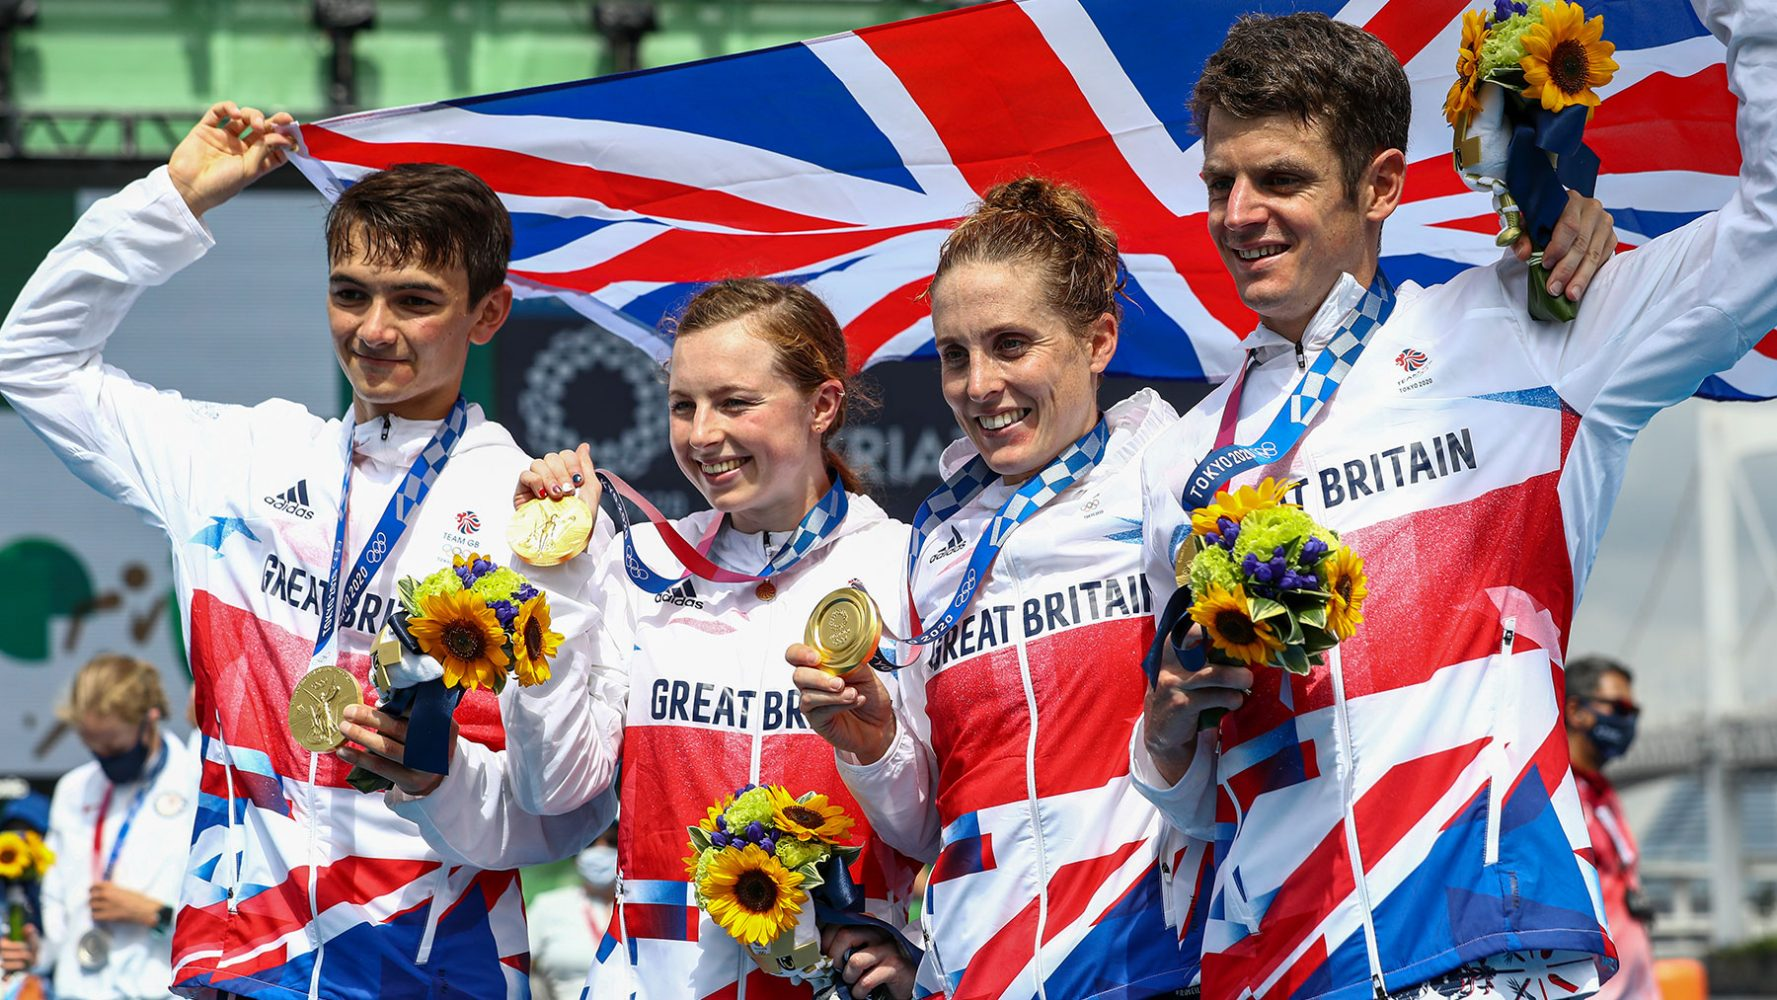 Team GB Tokyo 2020 Mixed Relay Triathlon Gold